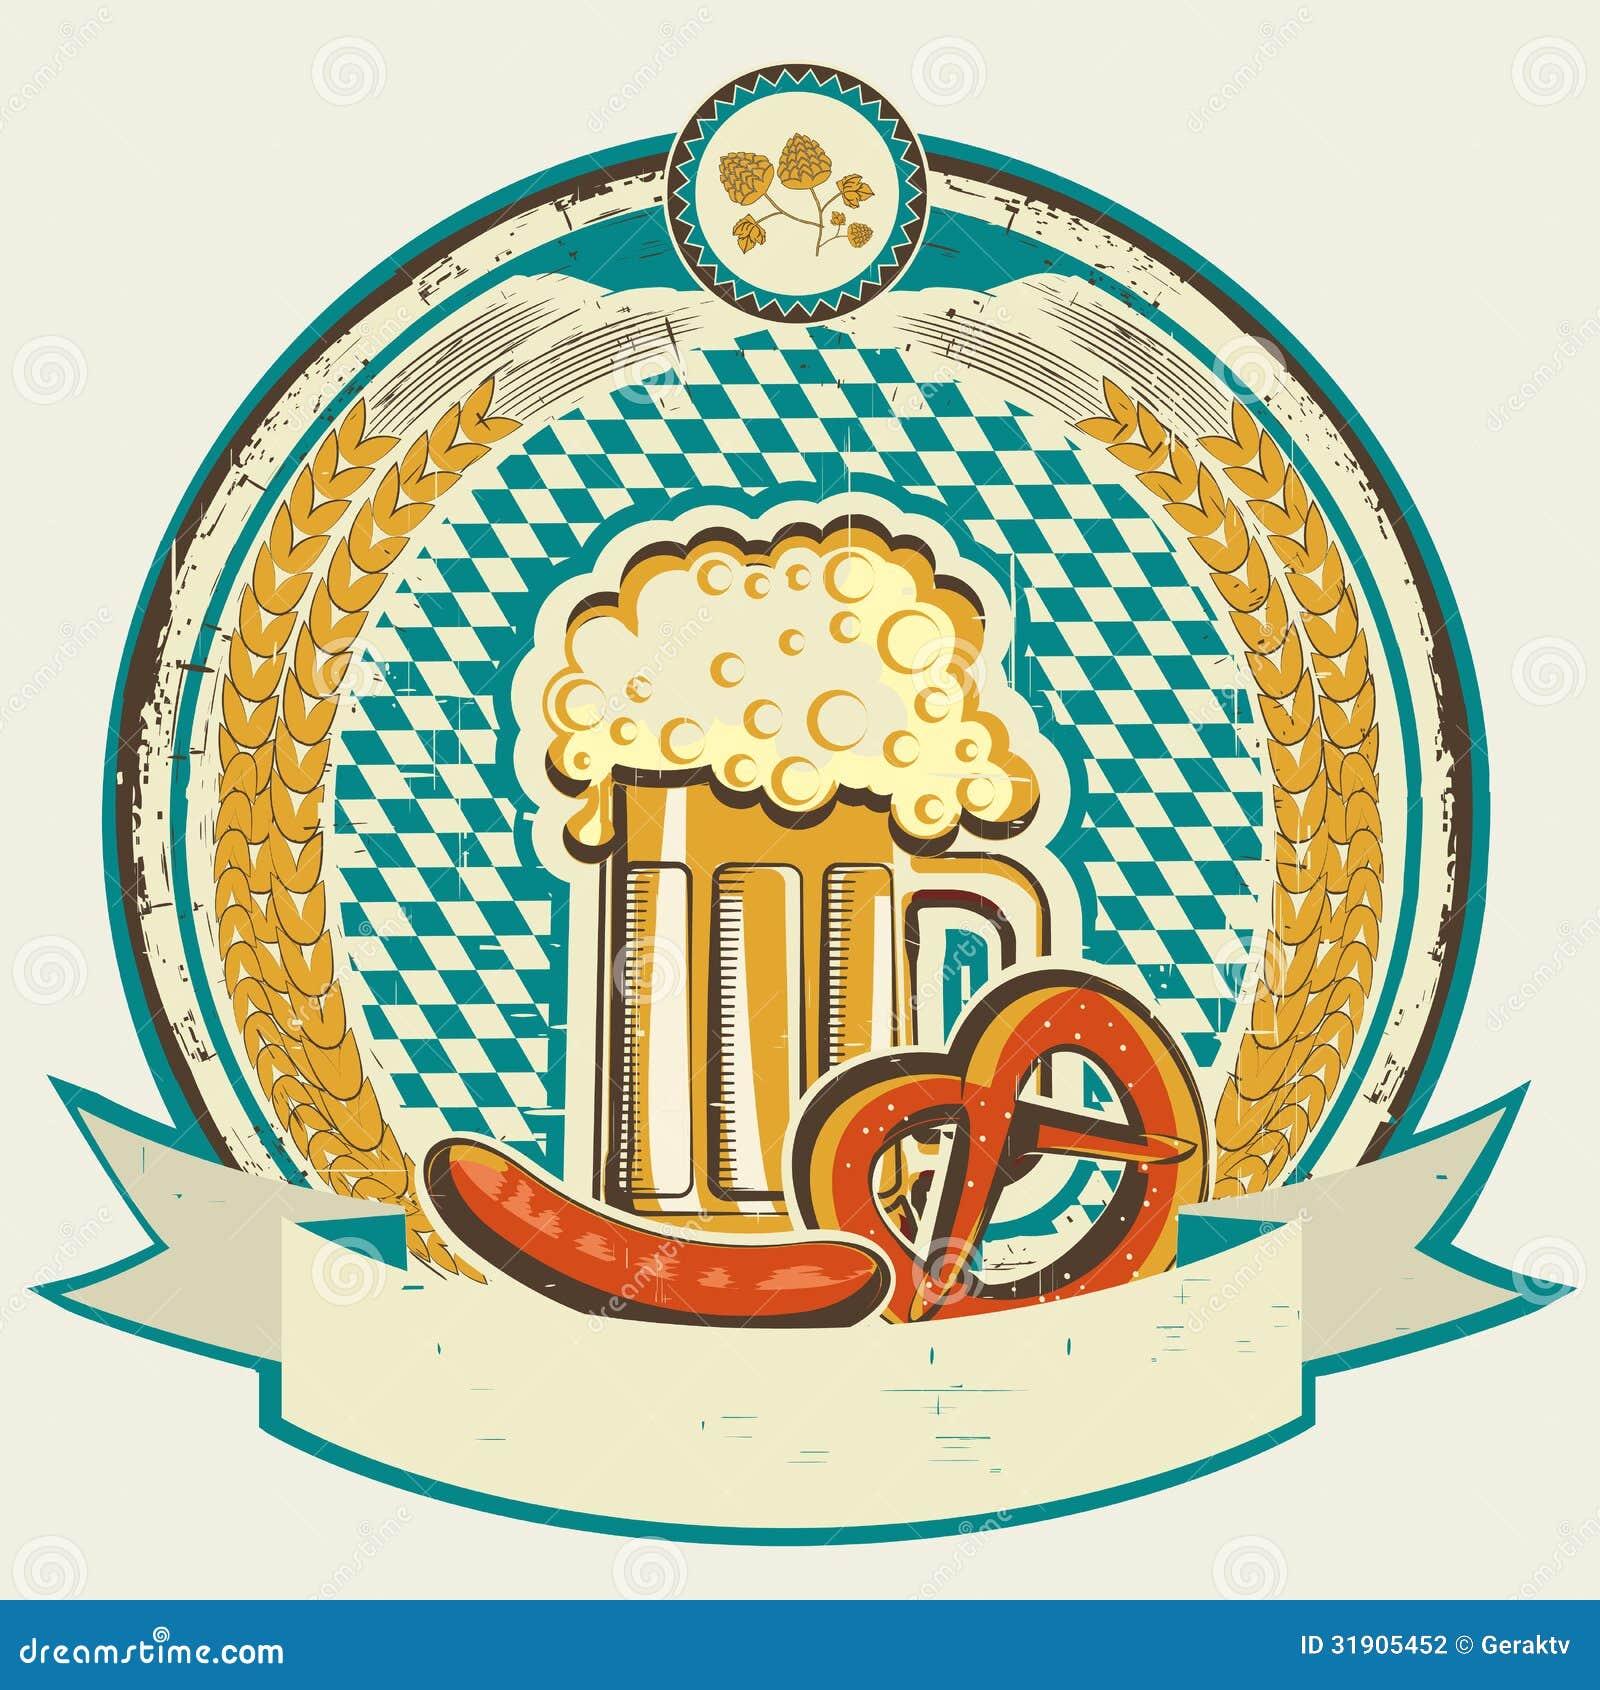 Vintage oktoberfest label with beer and food on ol